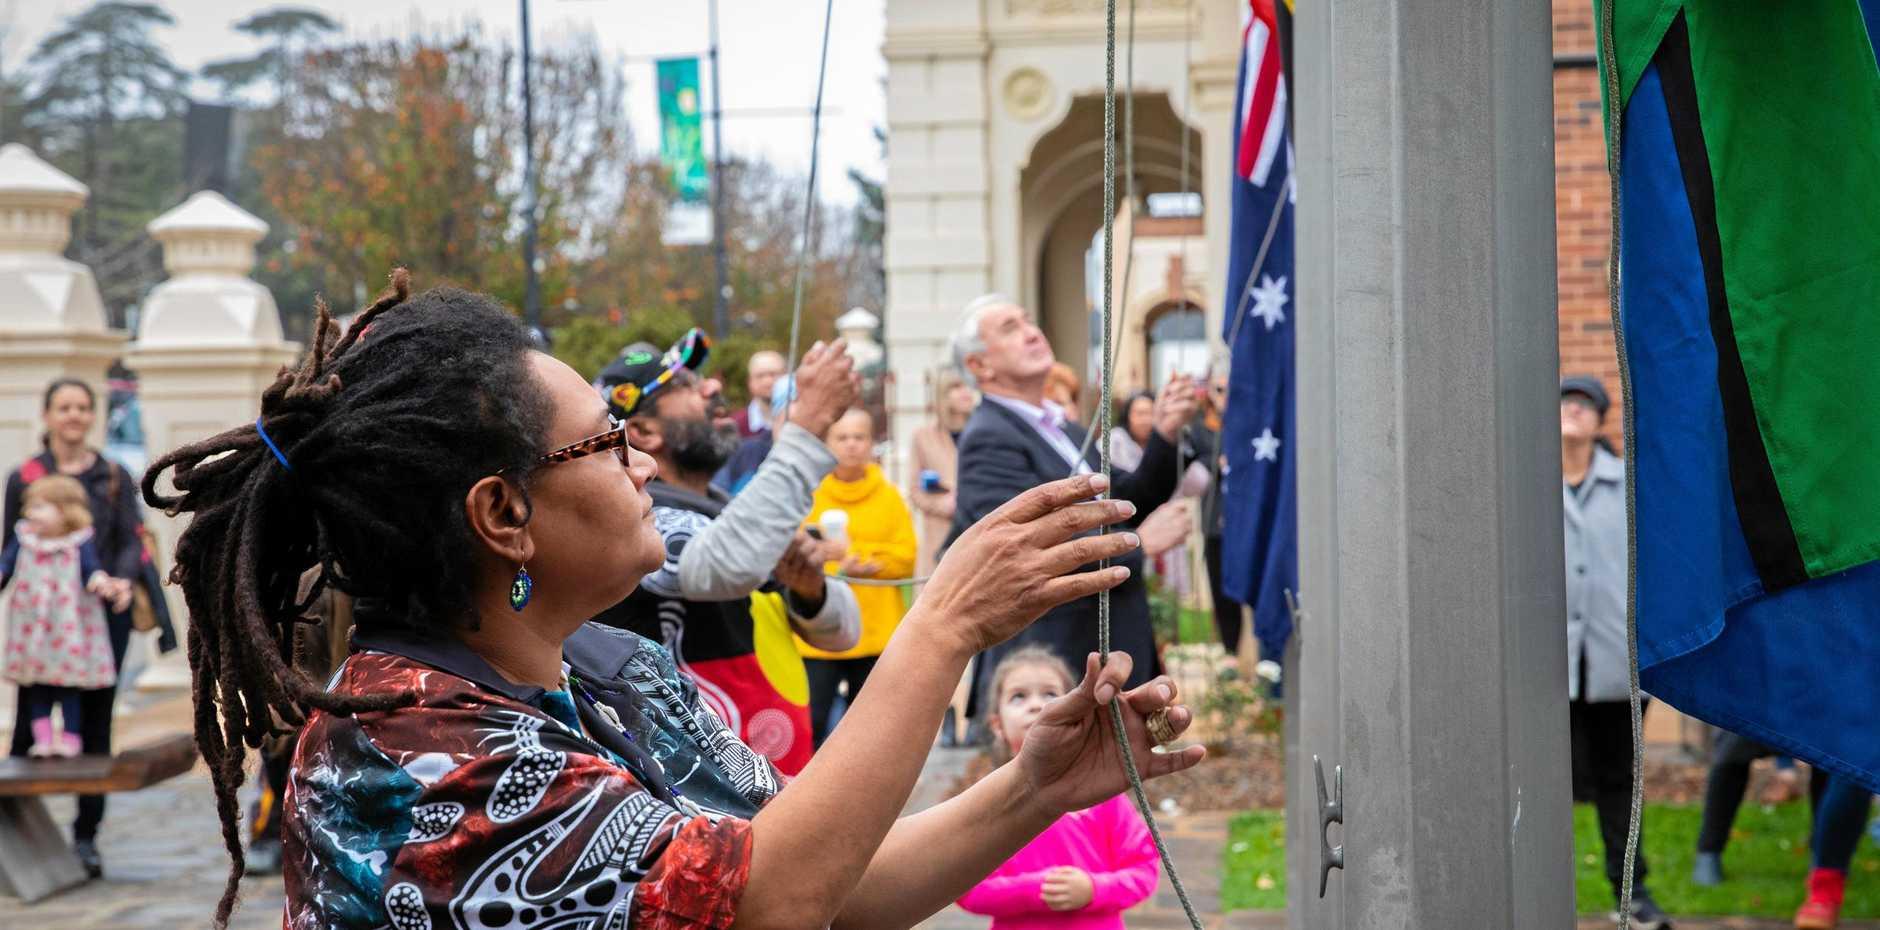 NAIDOC: Katie McLvor-Oui raises a flag at NAIDOC week celebrations yesterday.